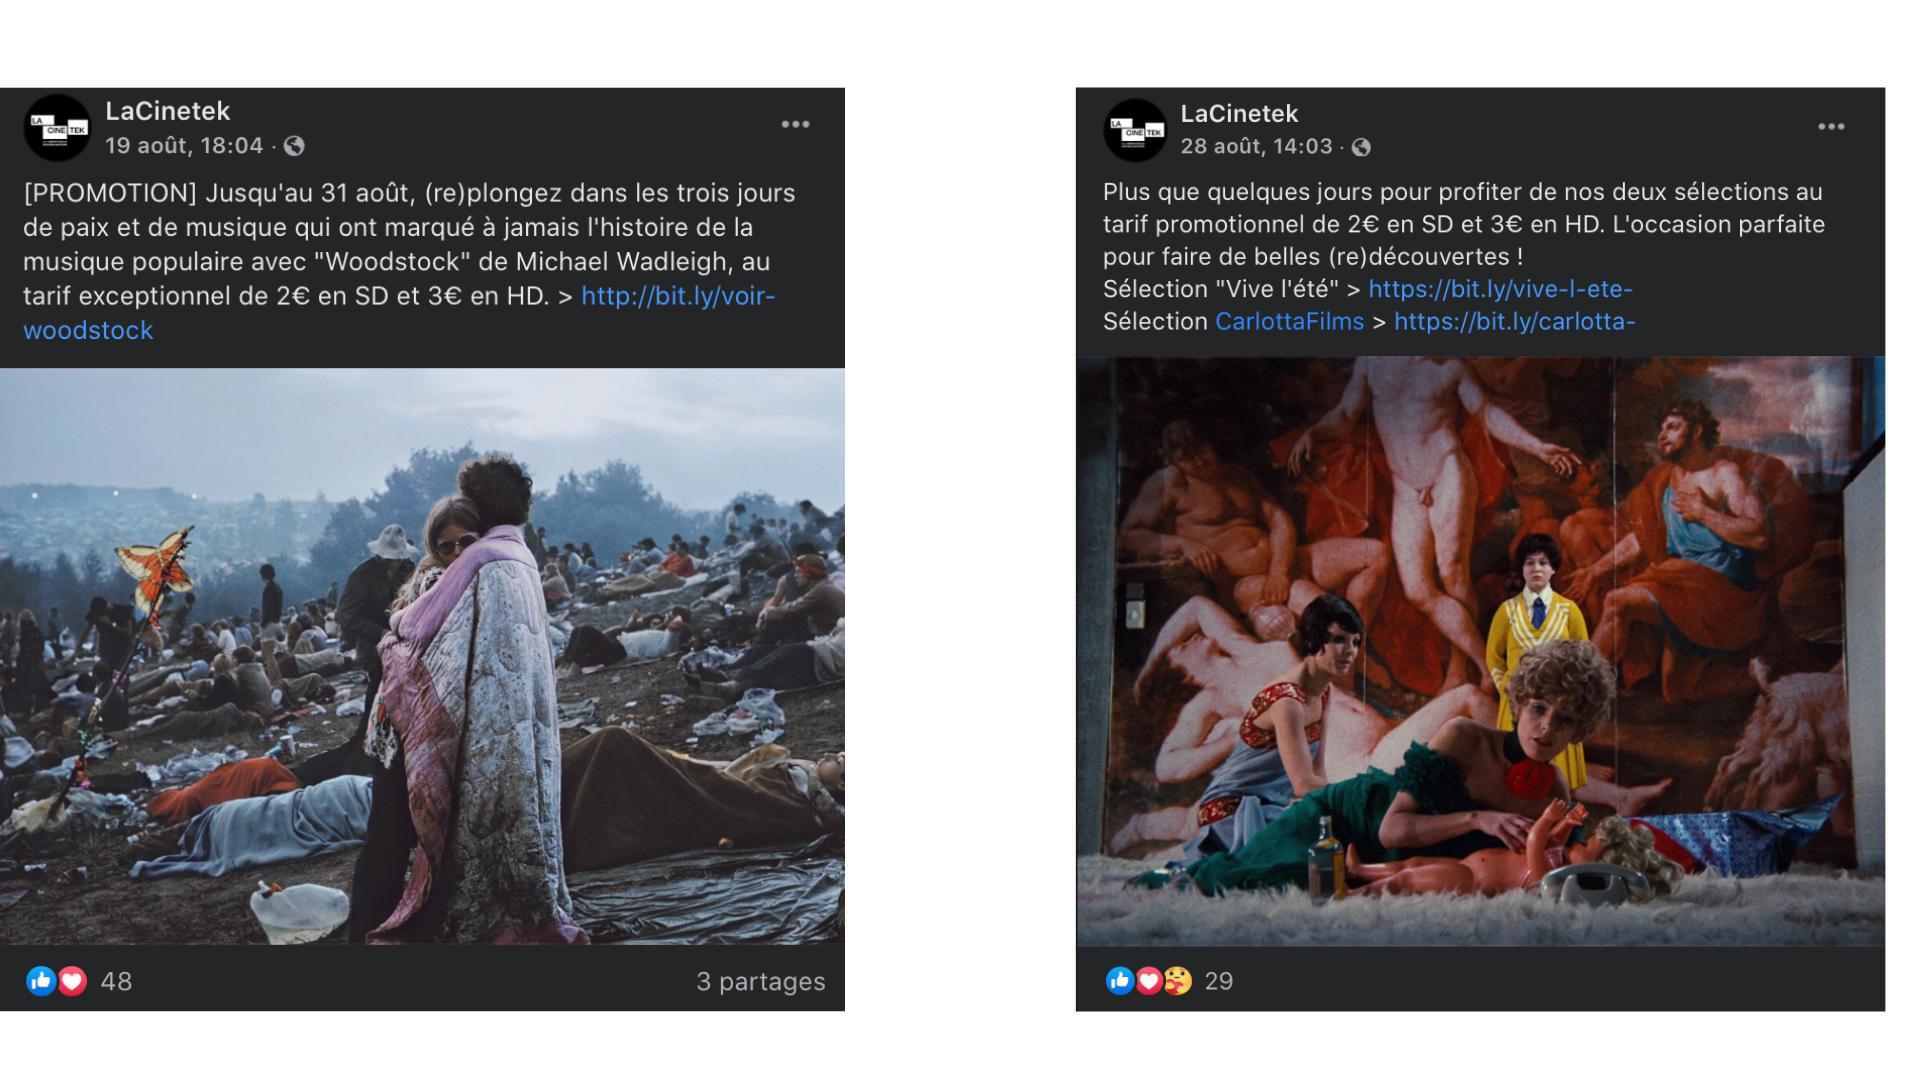 Facebook screens of LaCinetek company